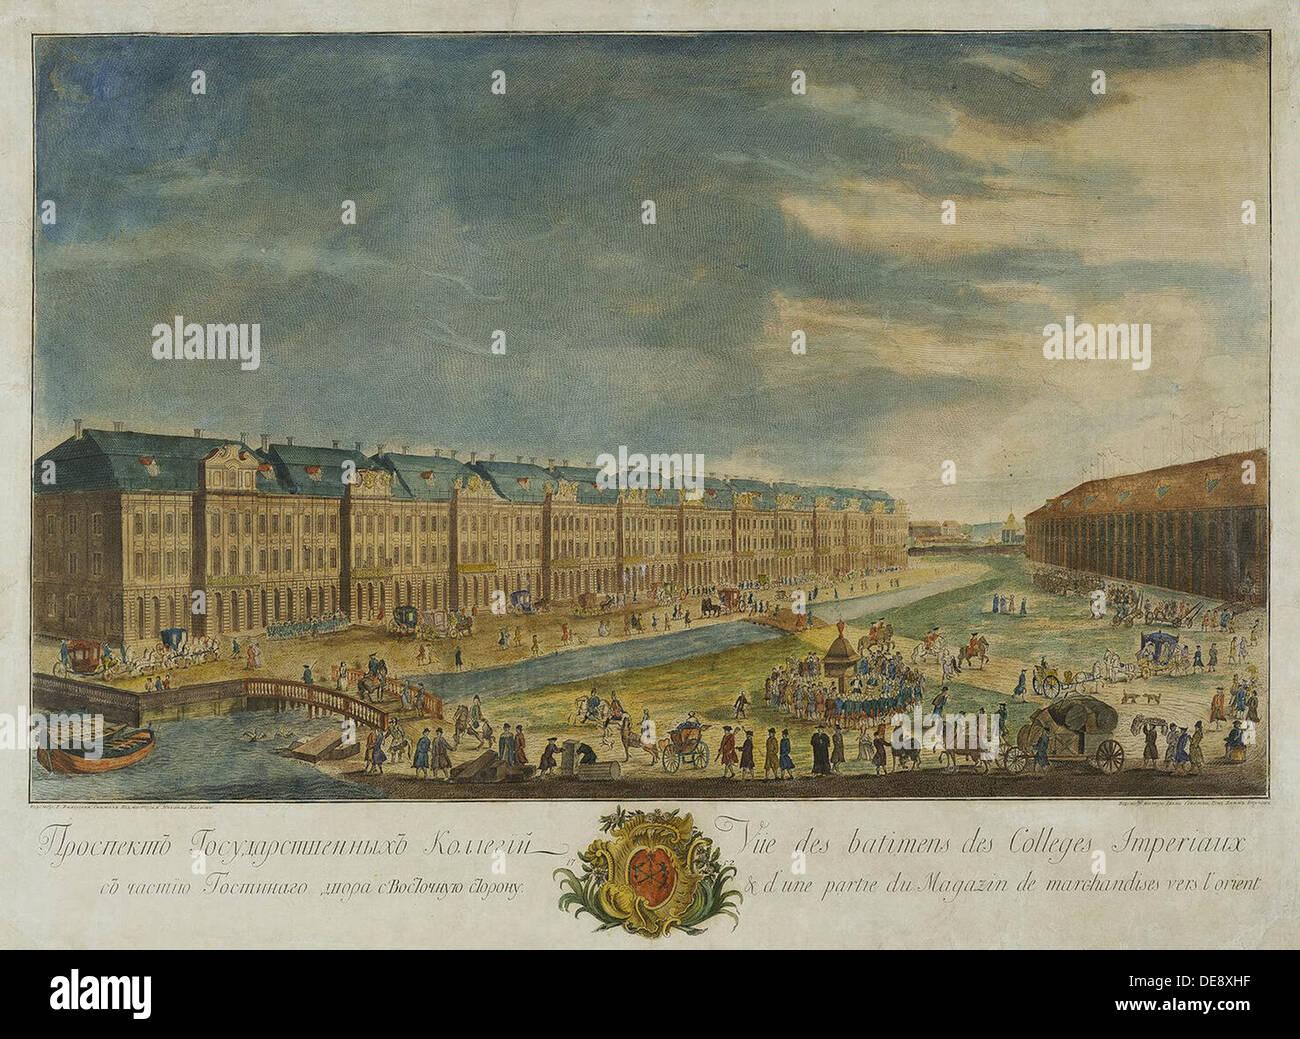 Avis des Douze Collegia building à Saint-Pétersbourg, 1753. Artiste: Vnukov, Yekim Terentiyevich (1723/25-1762/63) Photo Stock